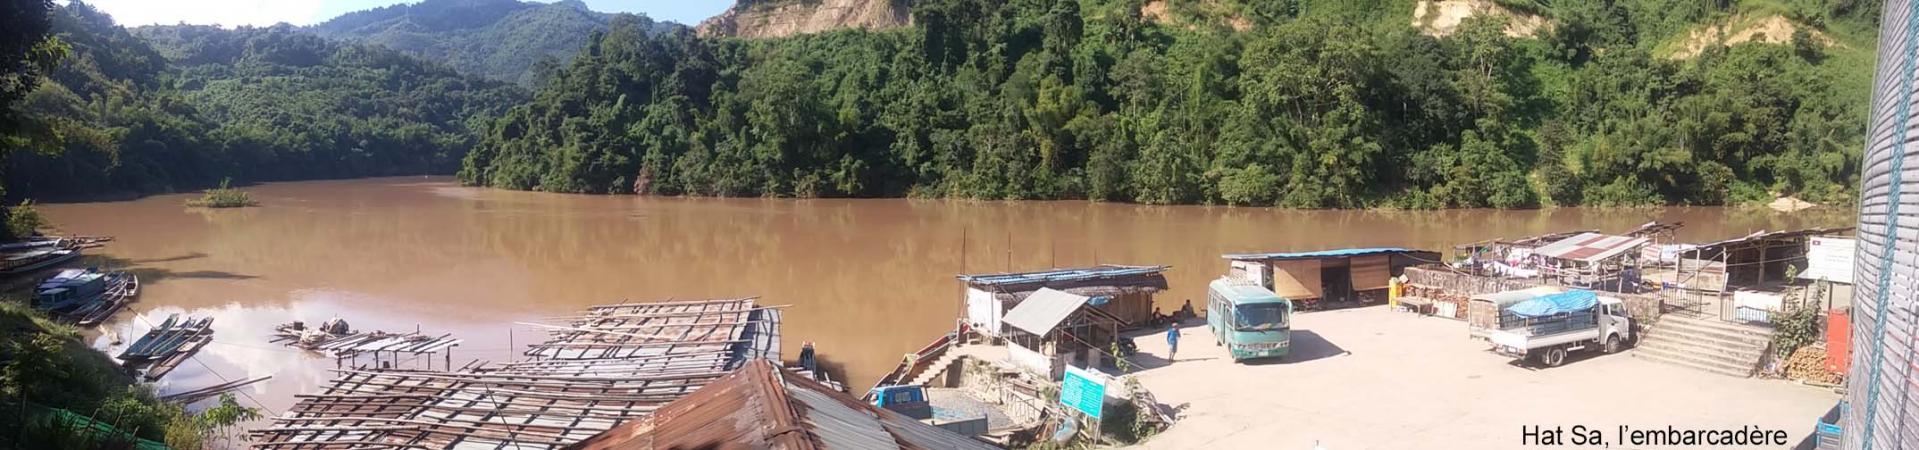 Nam Ou, embarcadère de Hat Sa